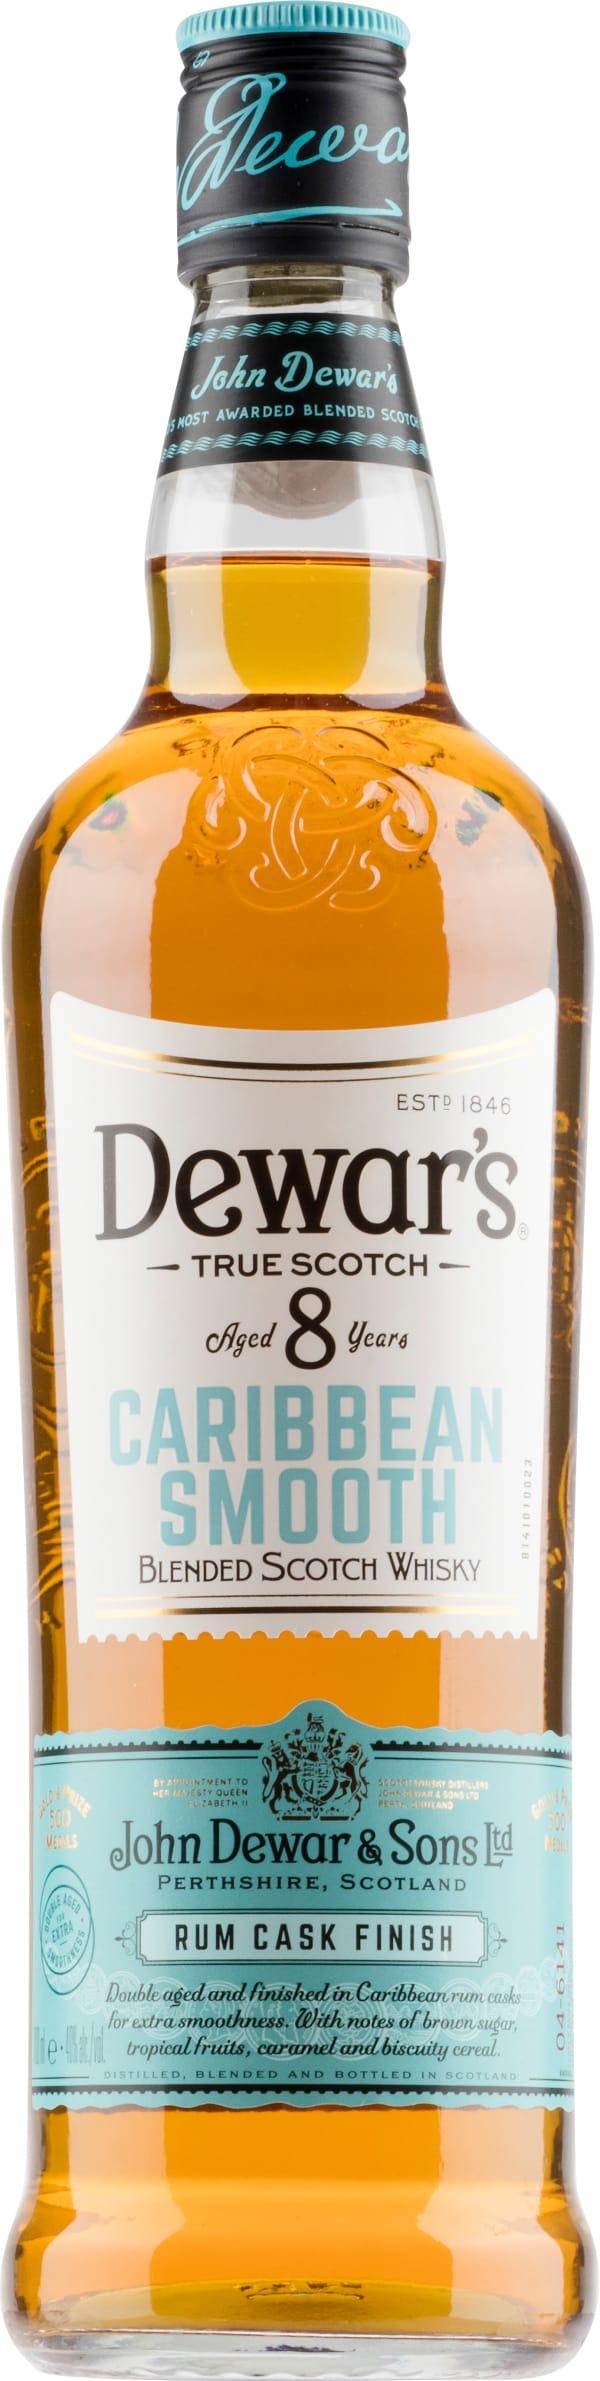 Dewar's Caribbean Smooth Aged 8 Years